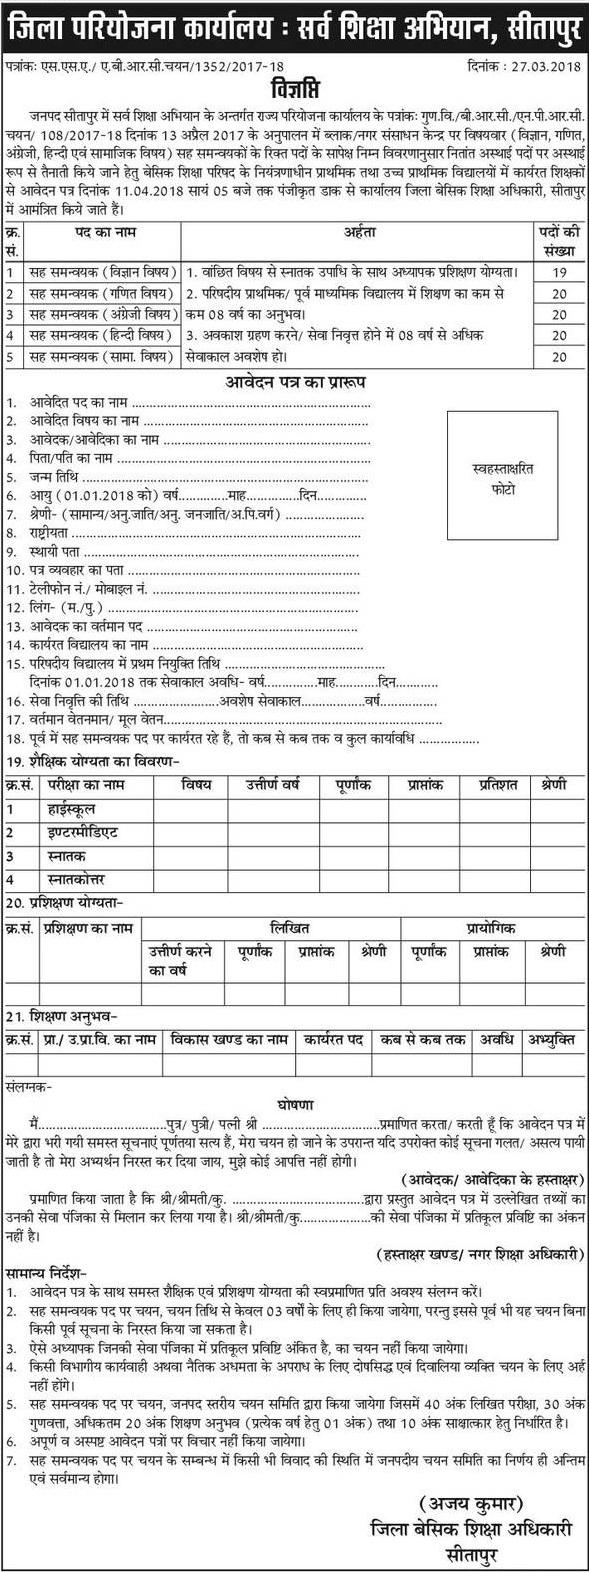 UP BSA Sitapur Recruitment 2018 99 सह-समन्वयक पद हेतु